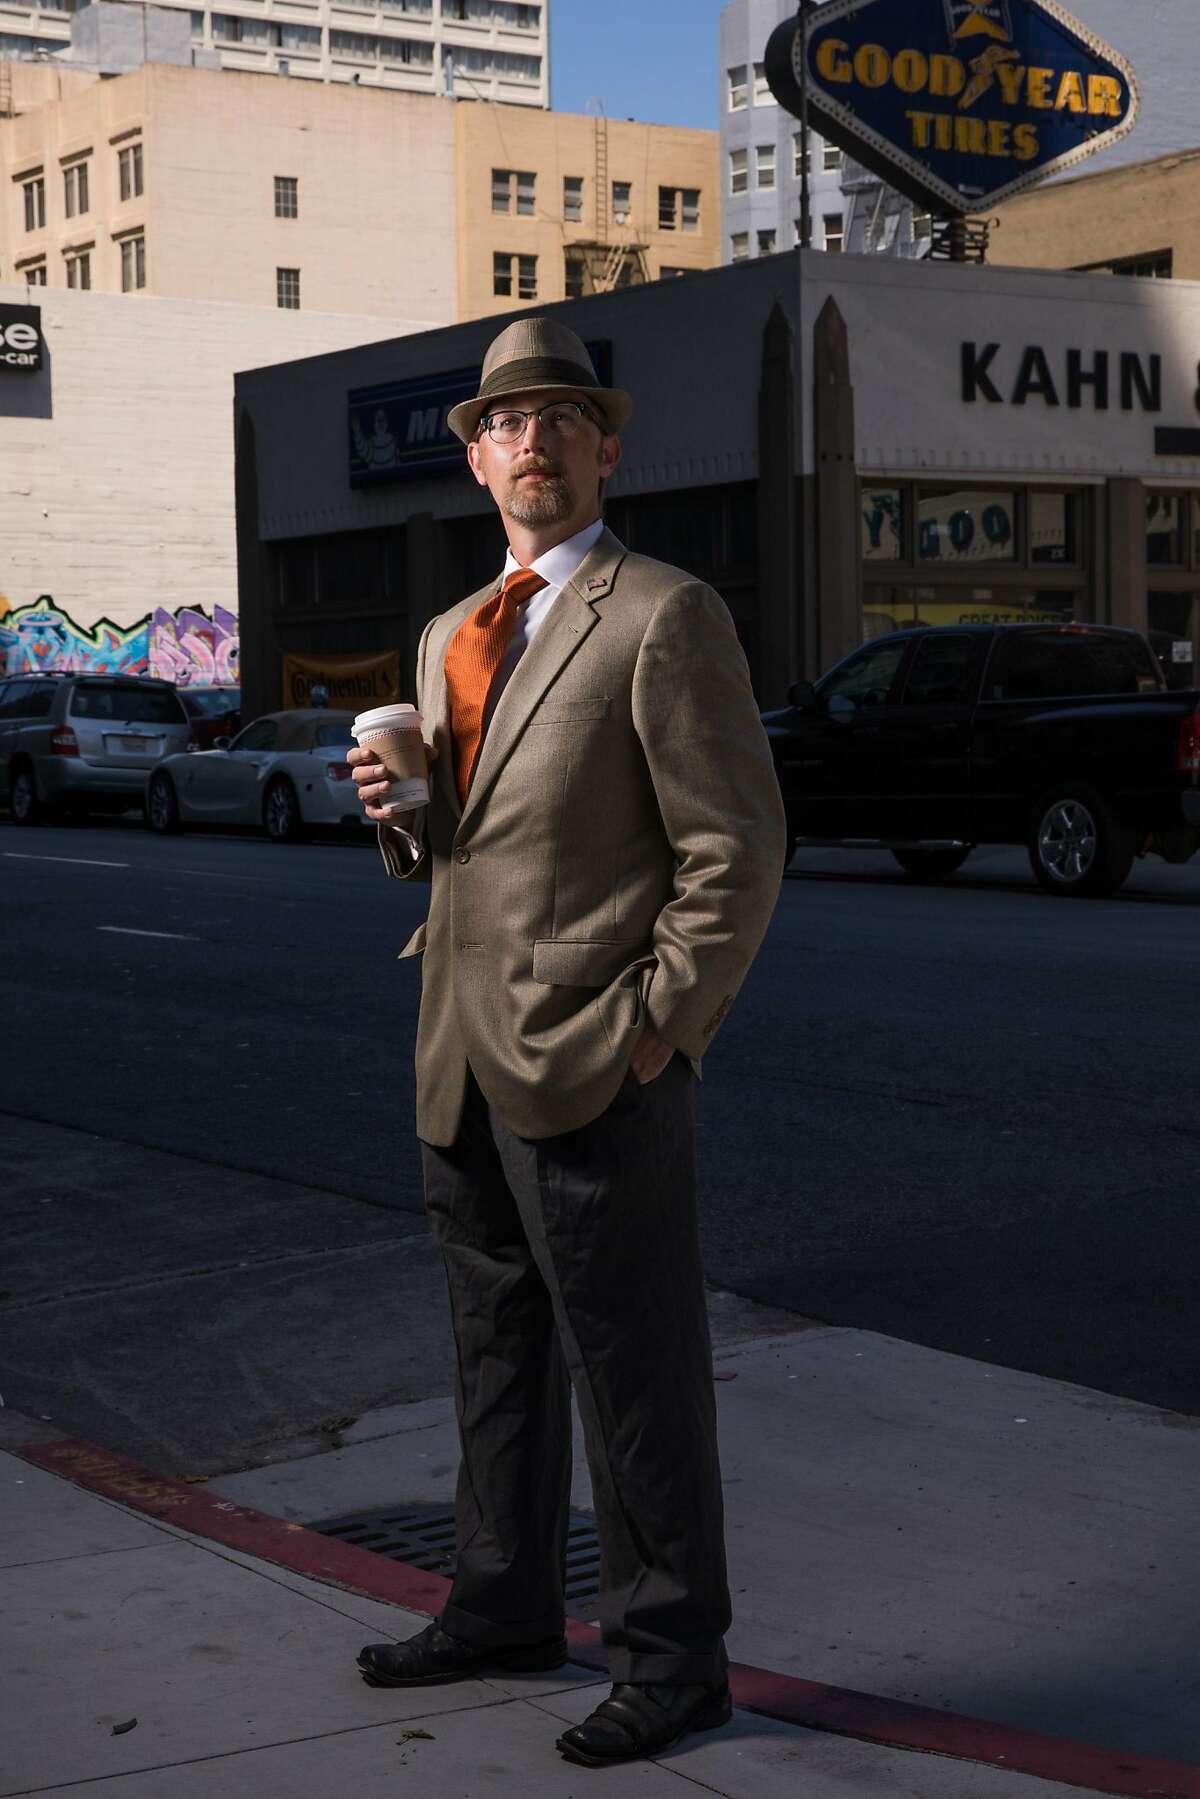 Jason Lee Jones photographed on the corner of Turk and Larkin Street in San Francisco, Calif. Friday, July 21, 2017.